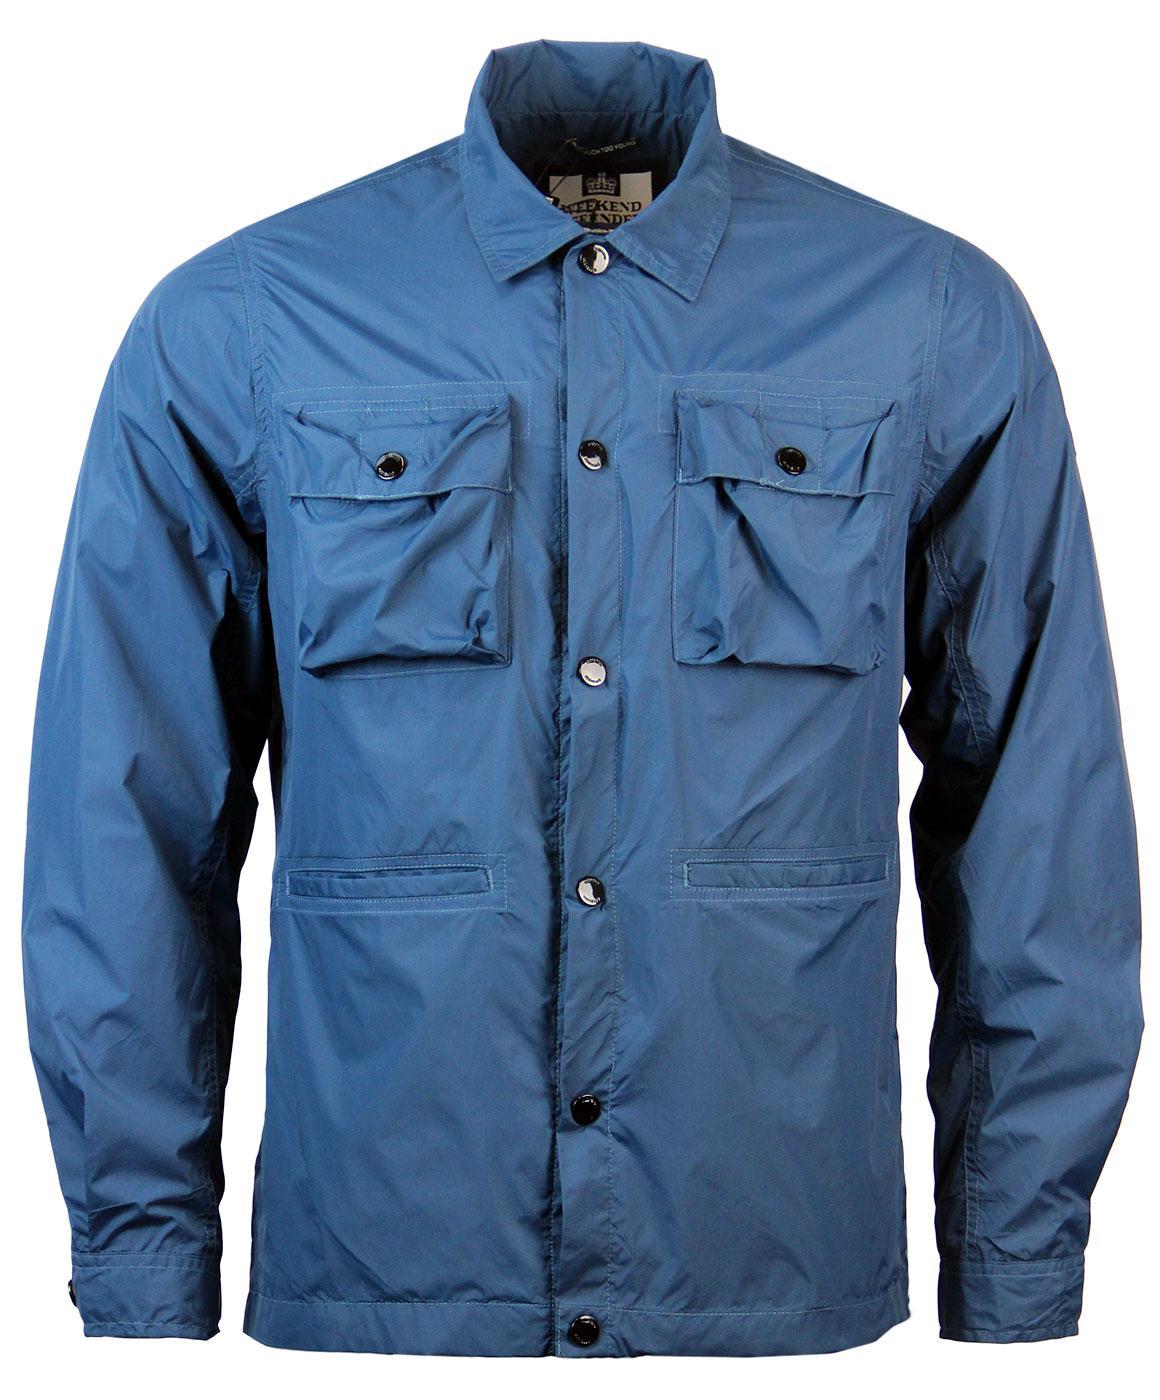 Sedgwick WEEKEND OFFENDER Overshirt Safari Jacket